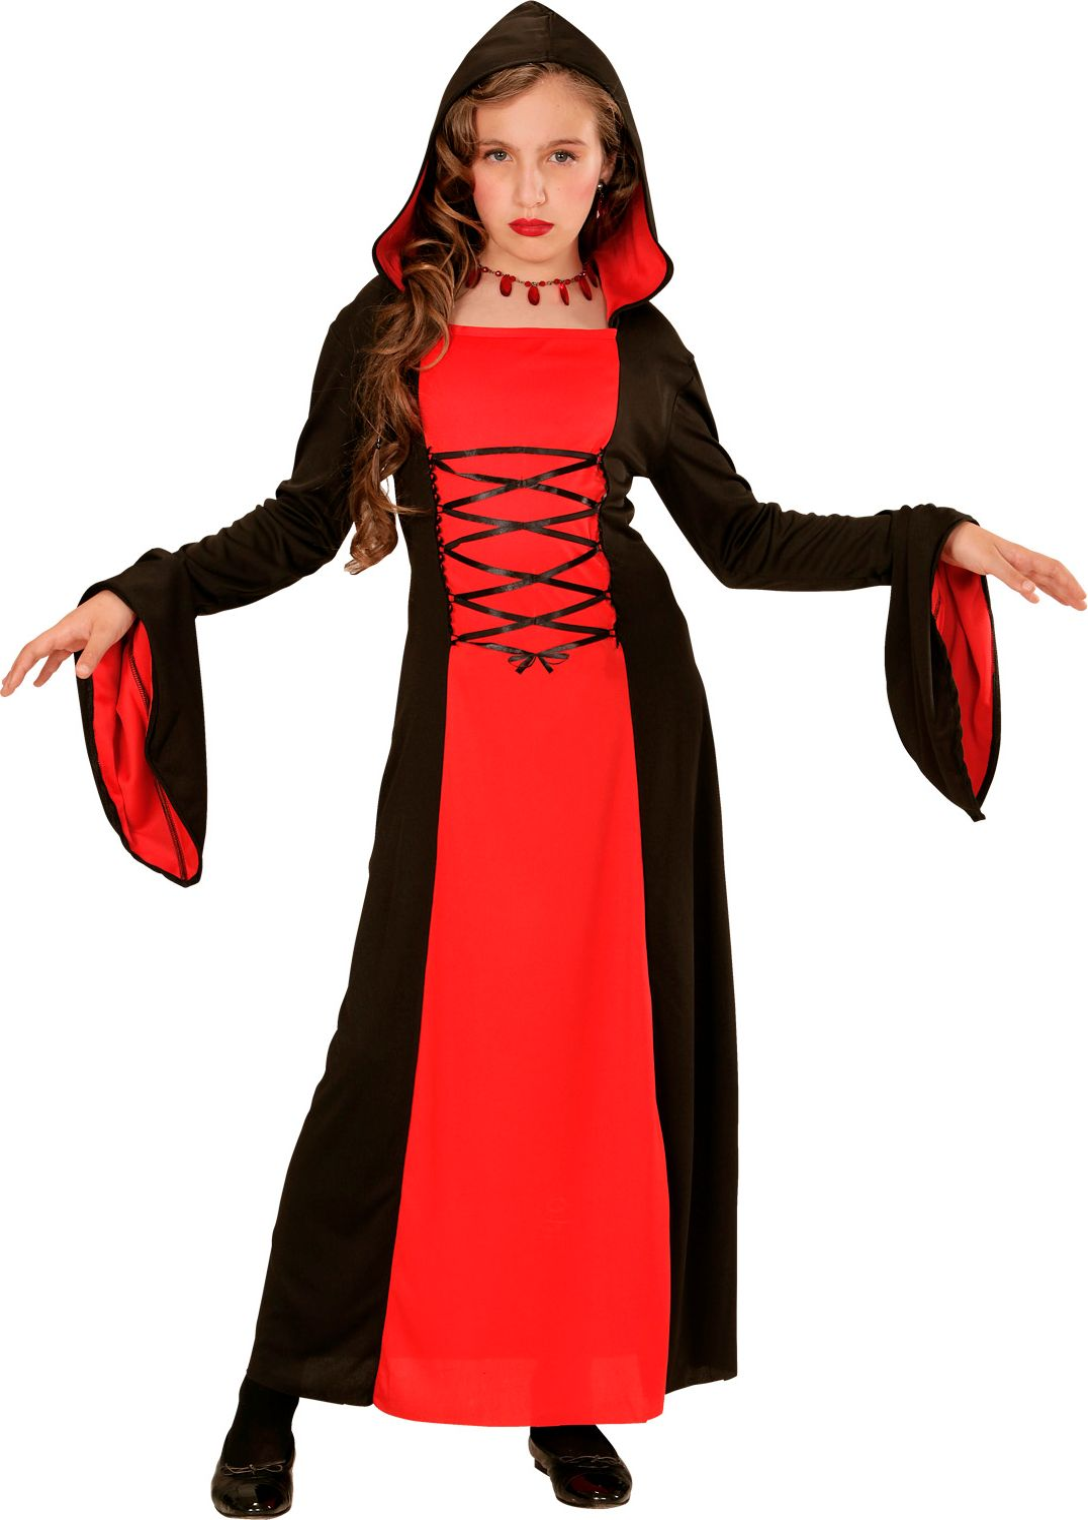 Gothic kleding meisje